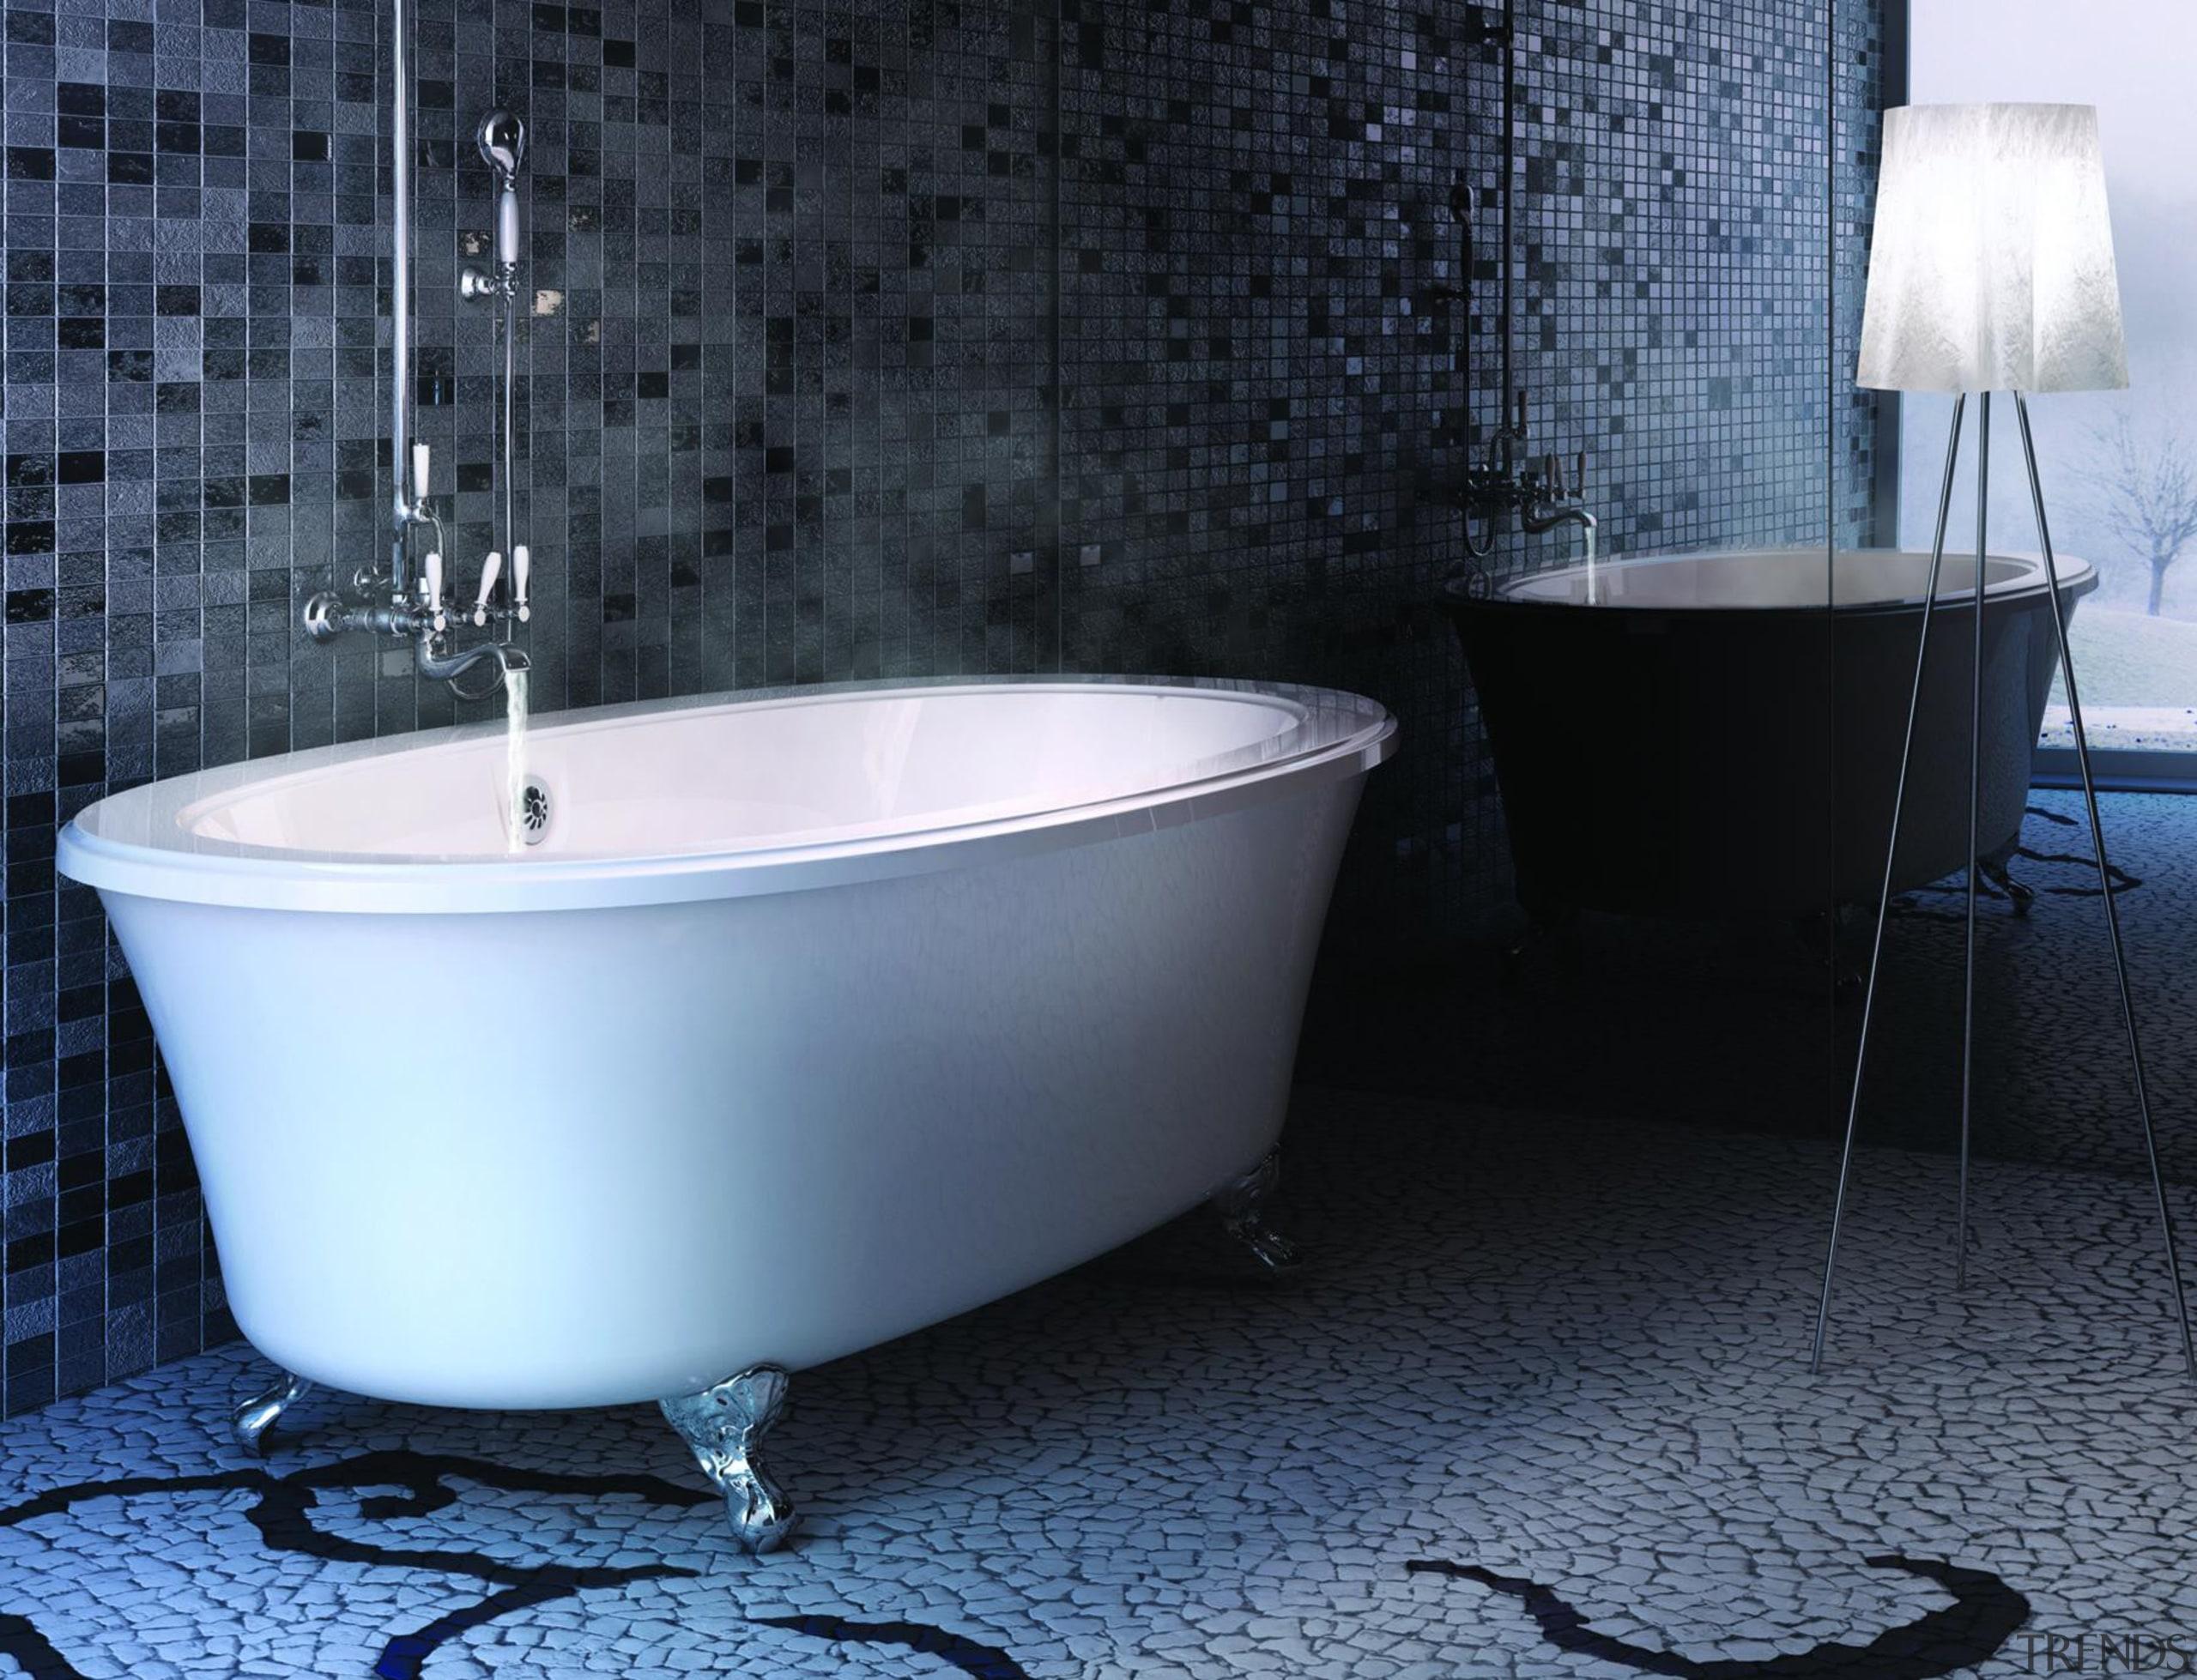 Always a classic, this claw-foot tub can be bathroom, bathtub, ceramic, floor, interior design, plumbing fixture, tap, tile, black